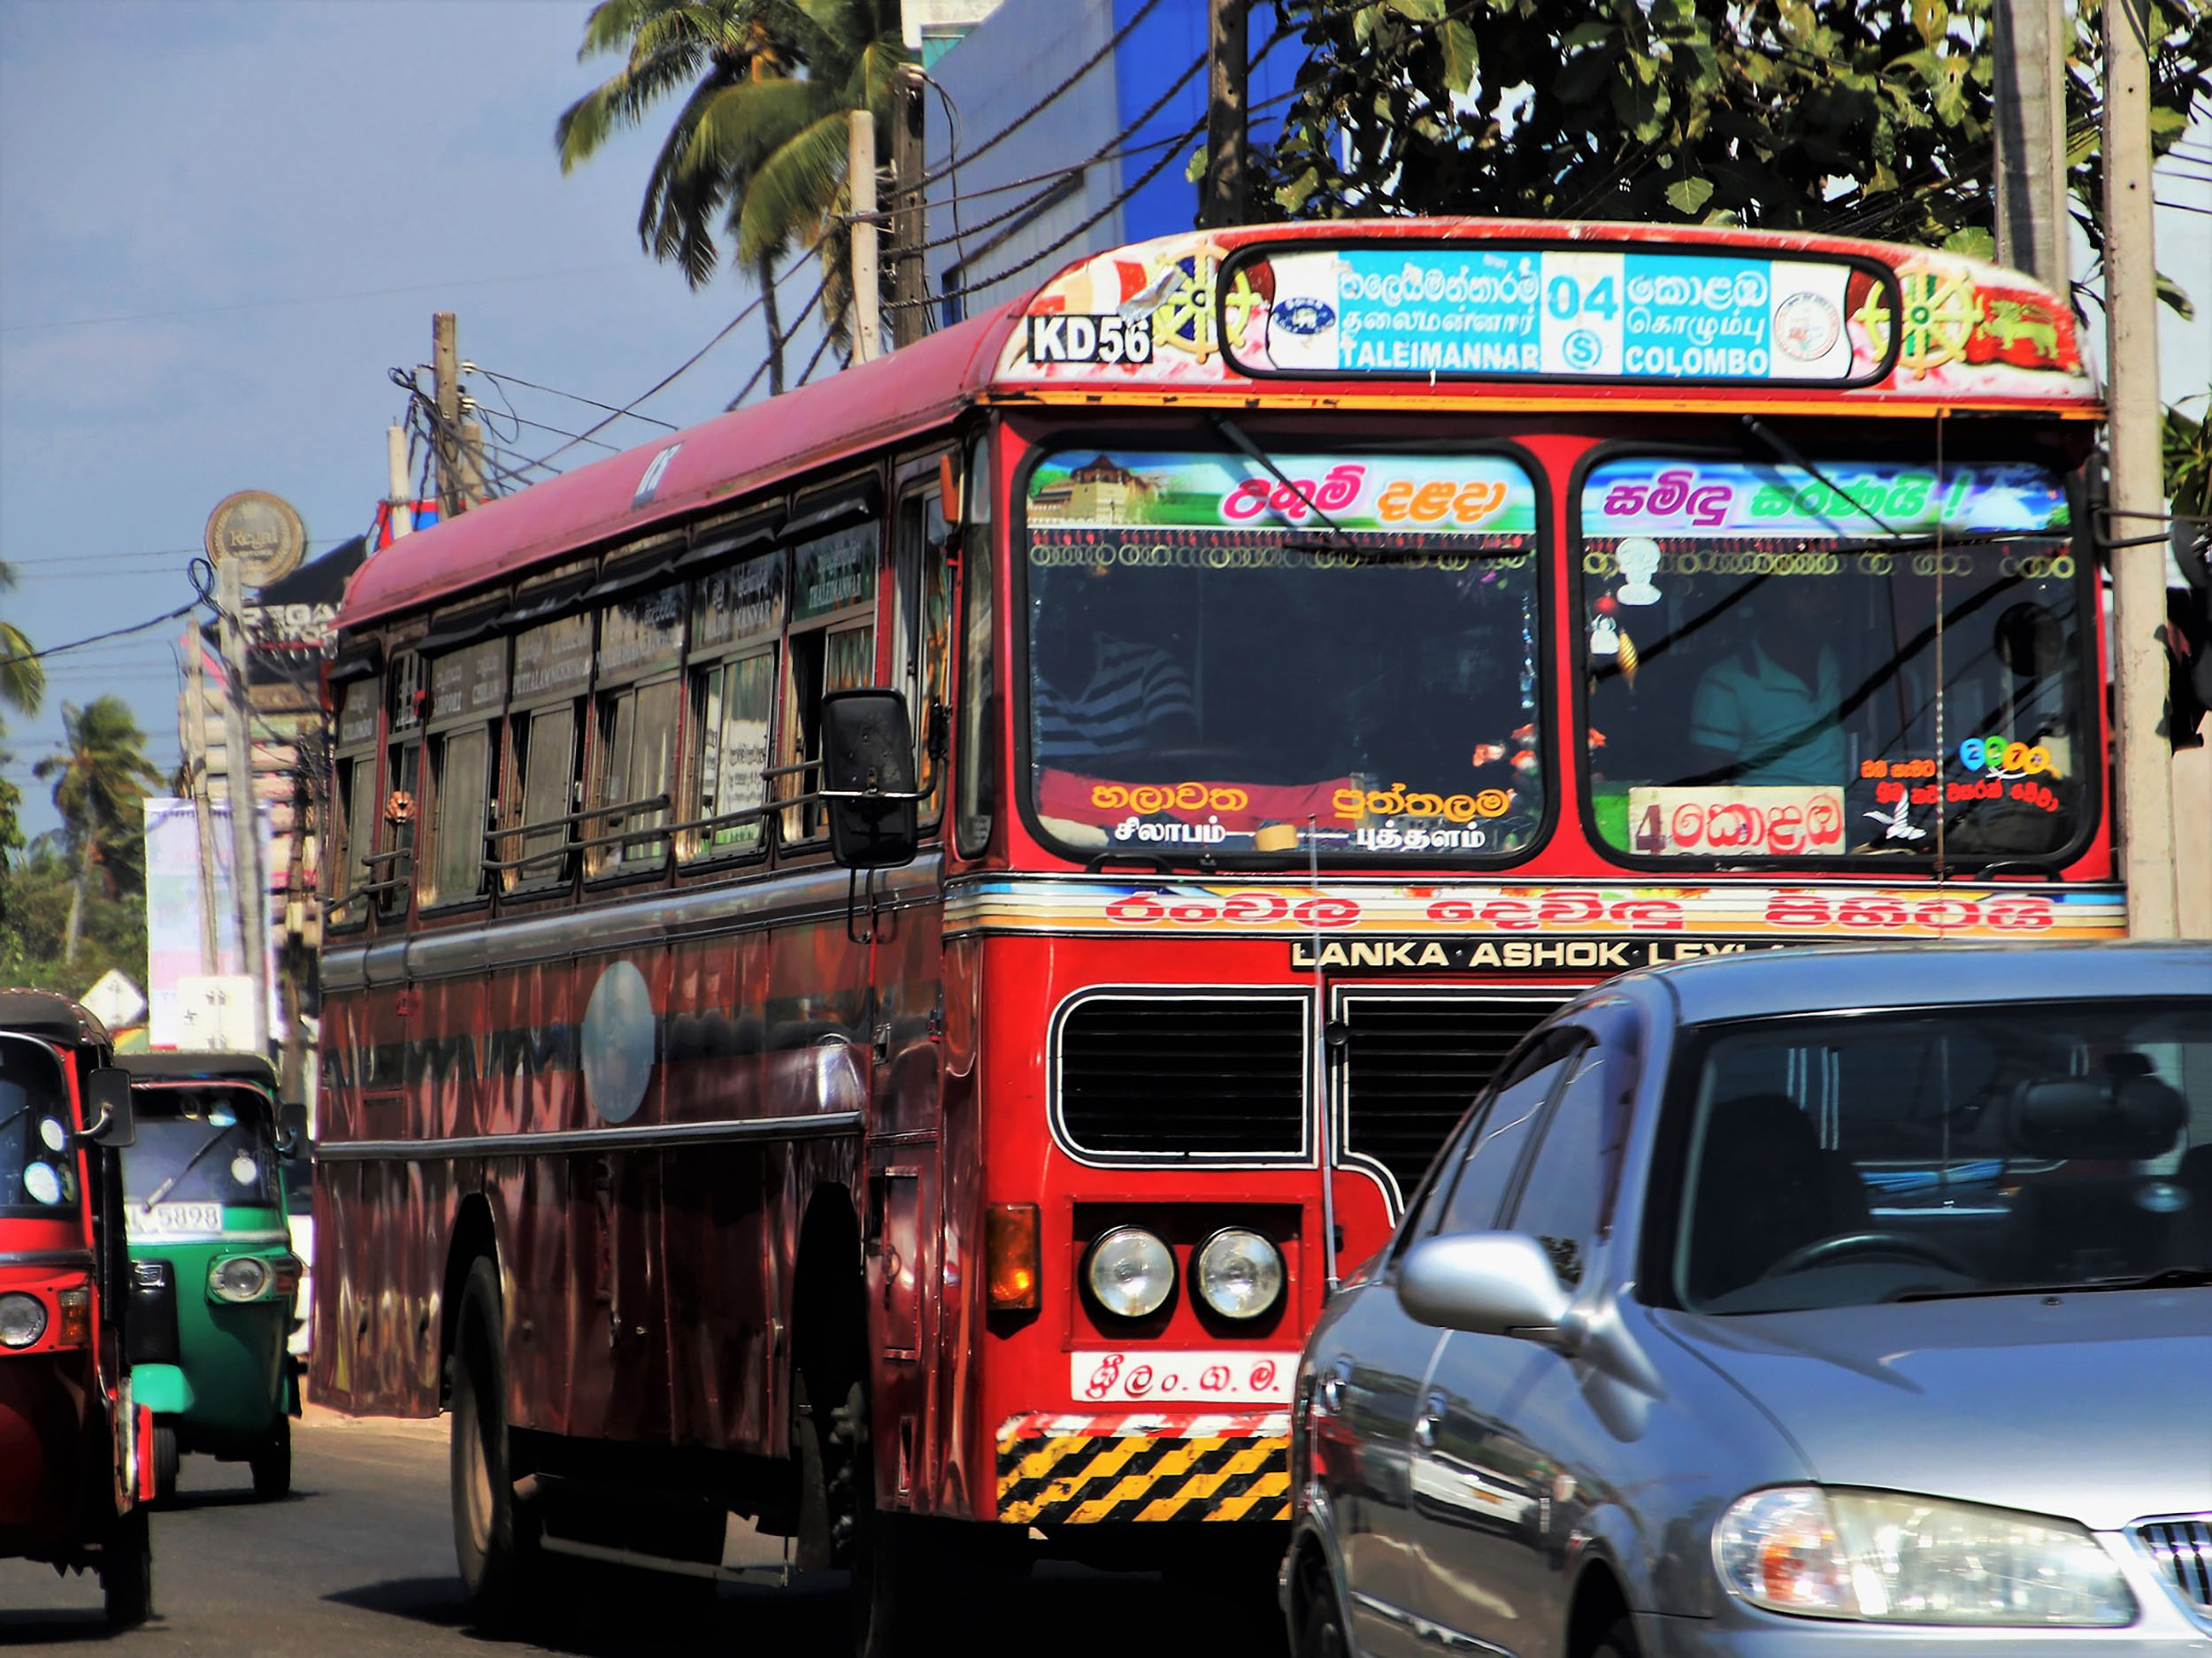 Colourful local Sri Lankan buses